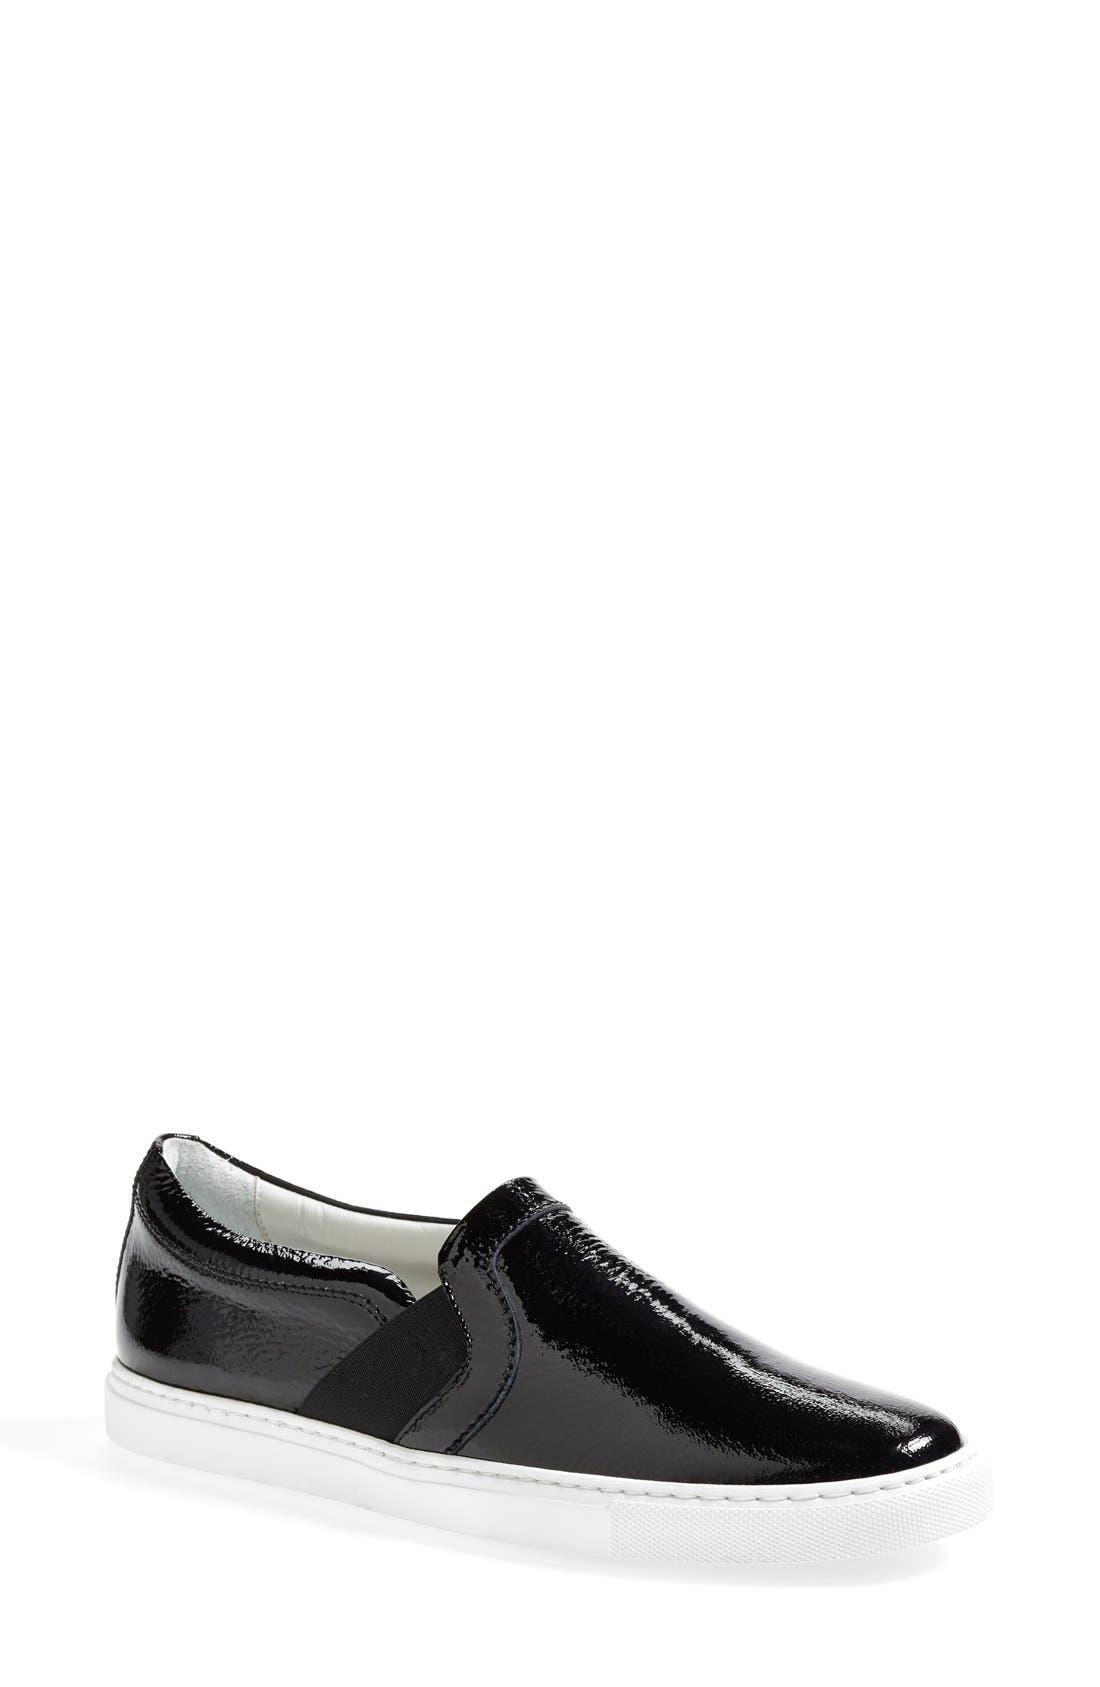 Alternate Image 1 Selected - Lanvin Patent Leather Skate Sneaker (Women)